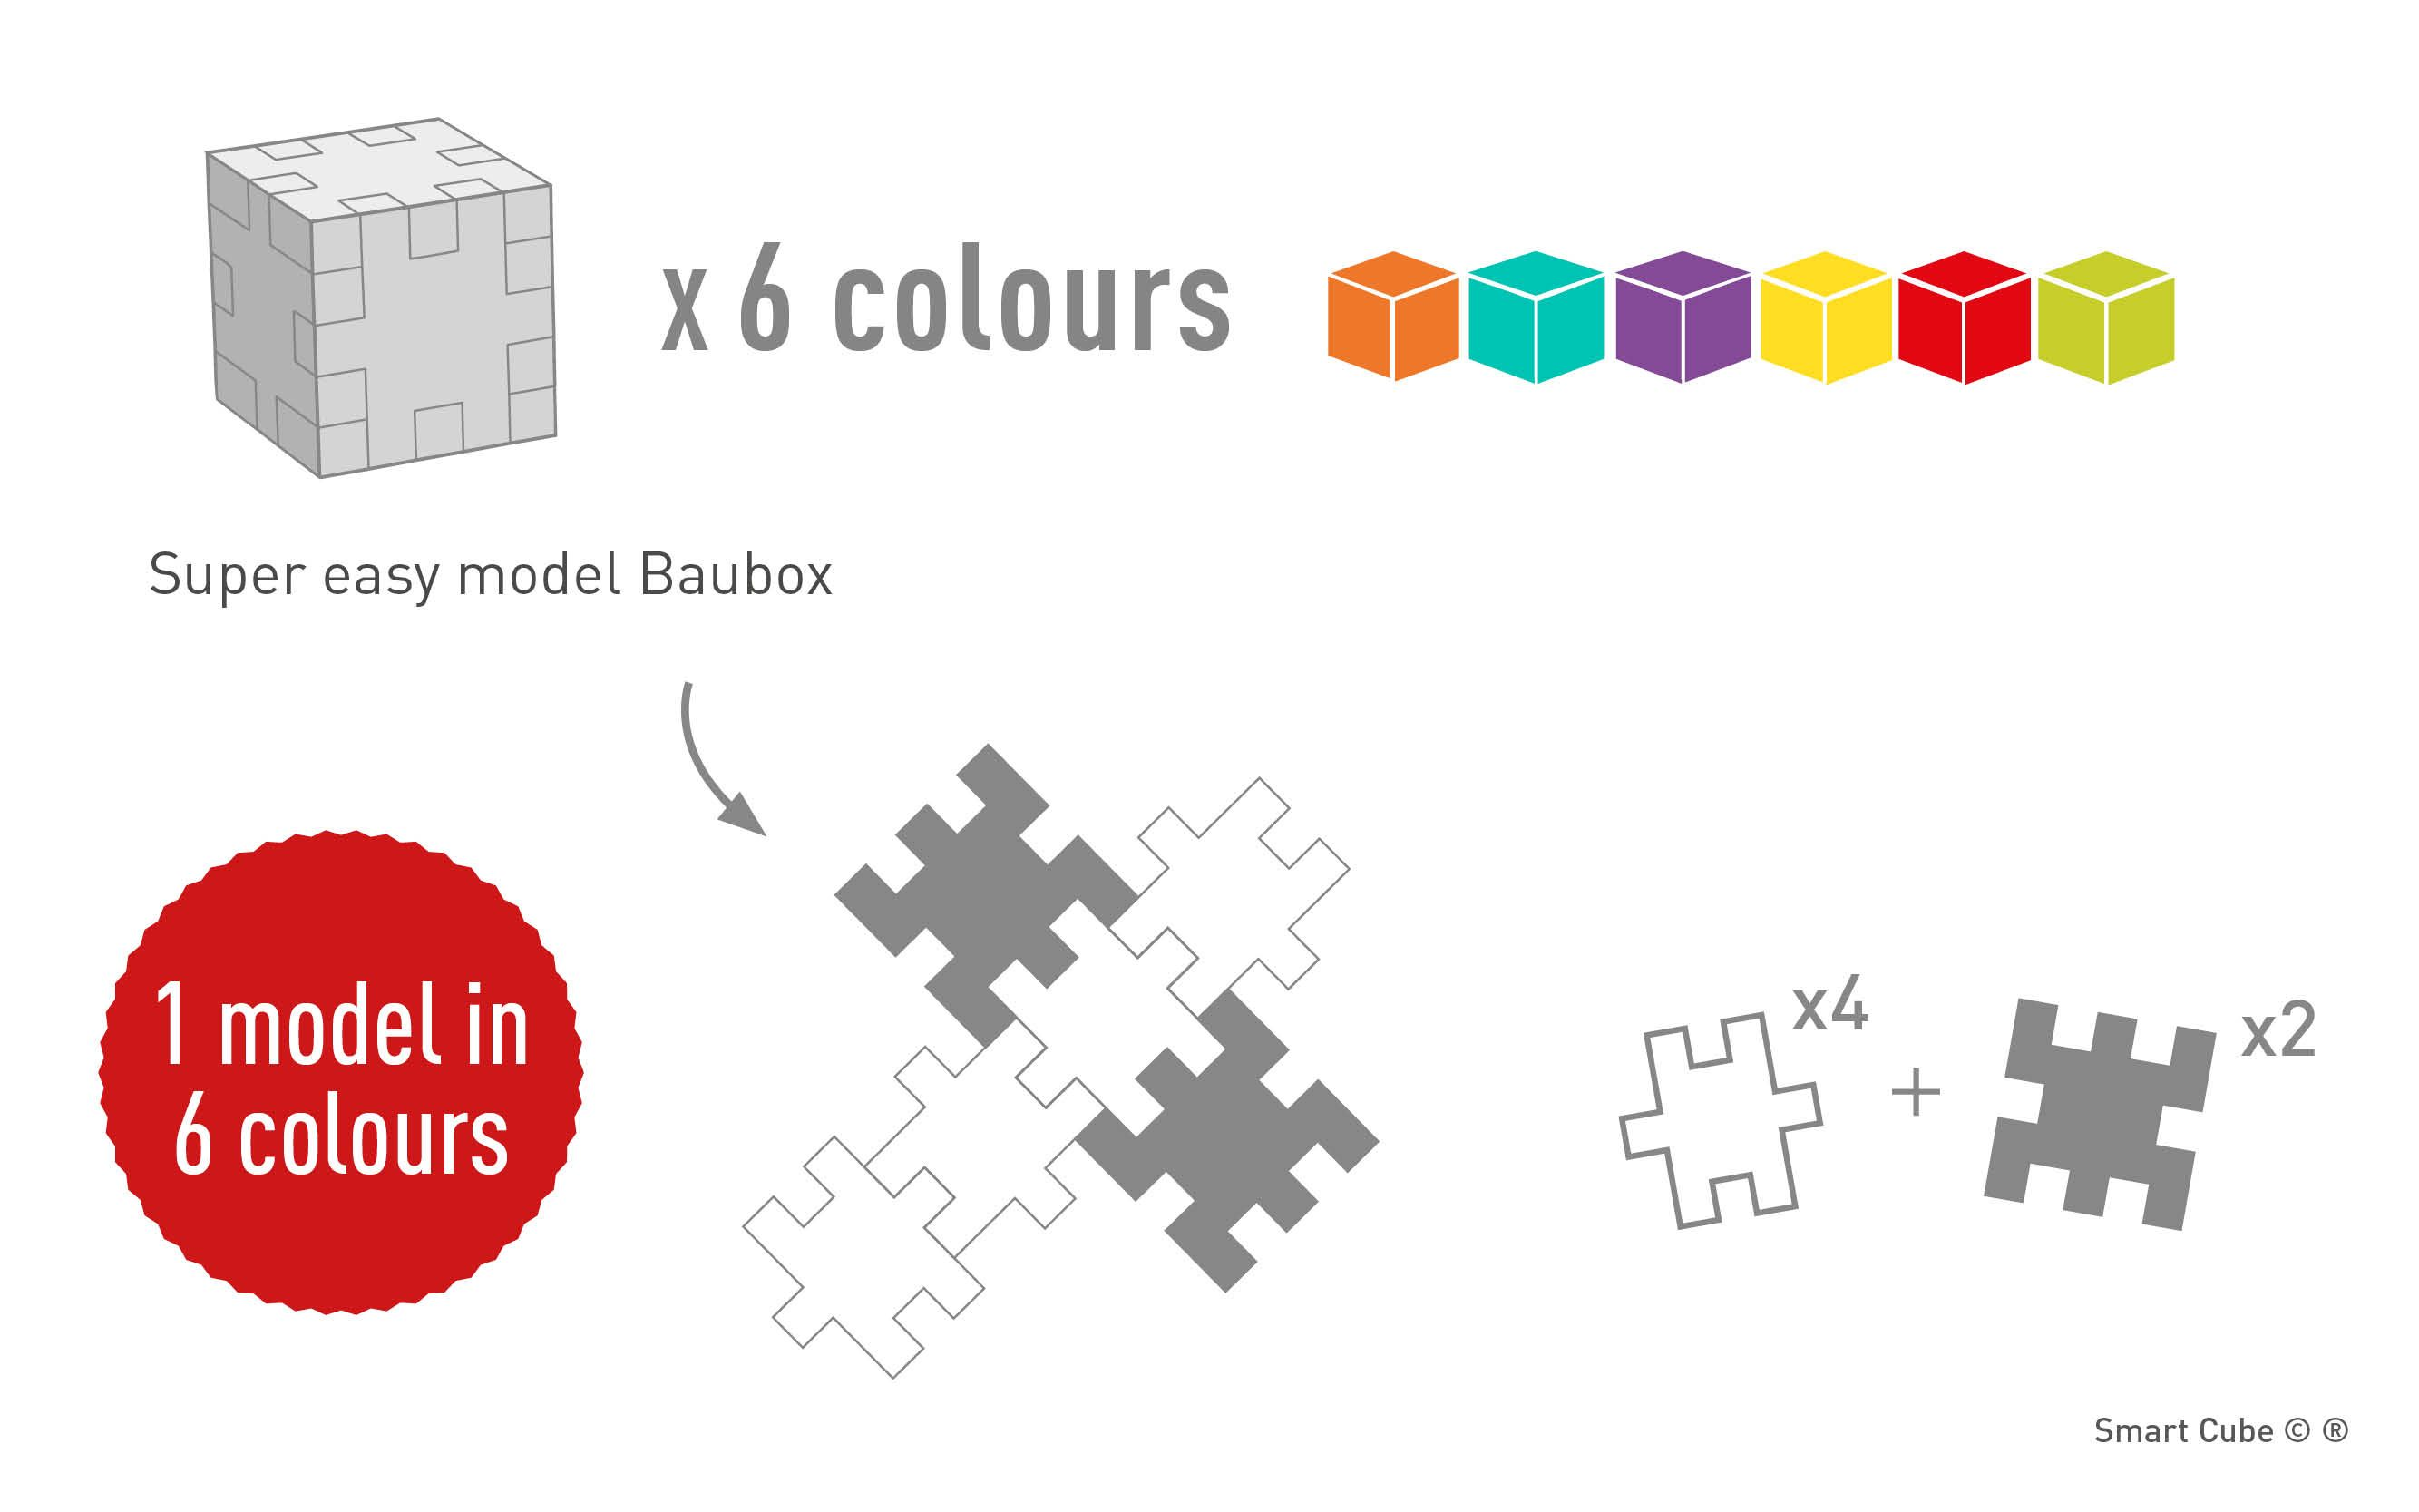 Smart_Cube_6-pack-6colours-1model-educational-preschool-game-3Dpuzzles